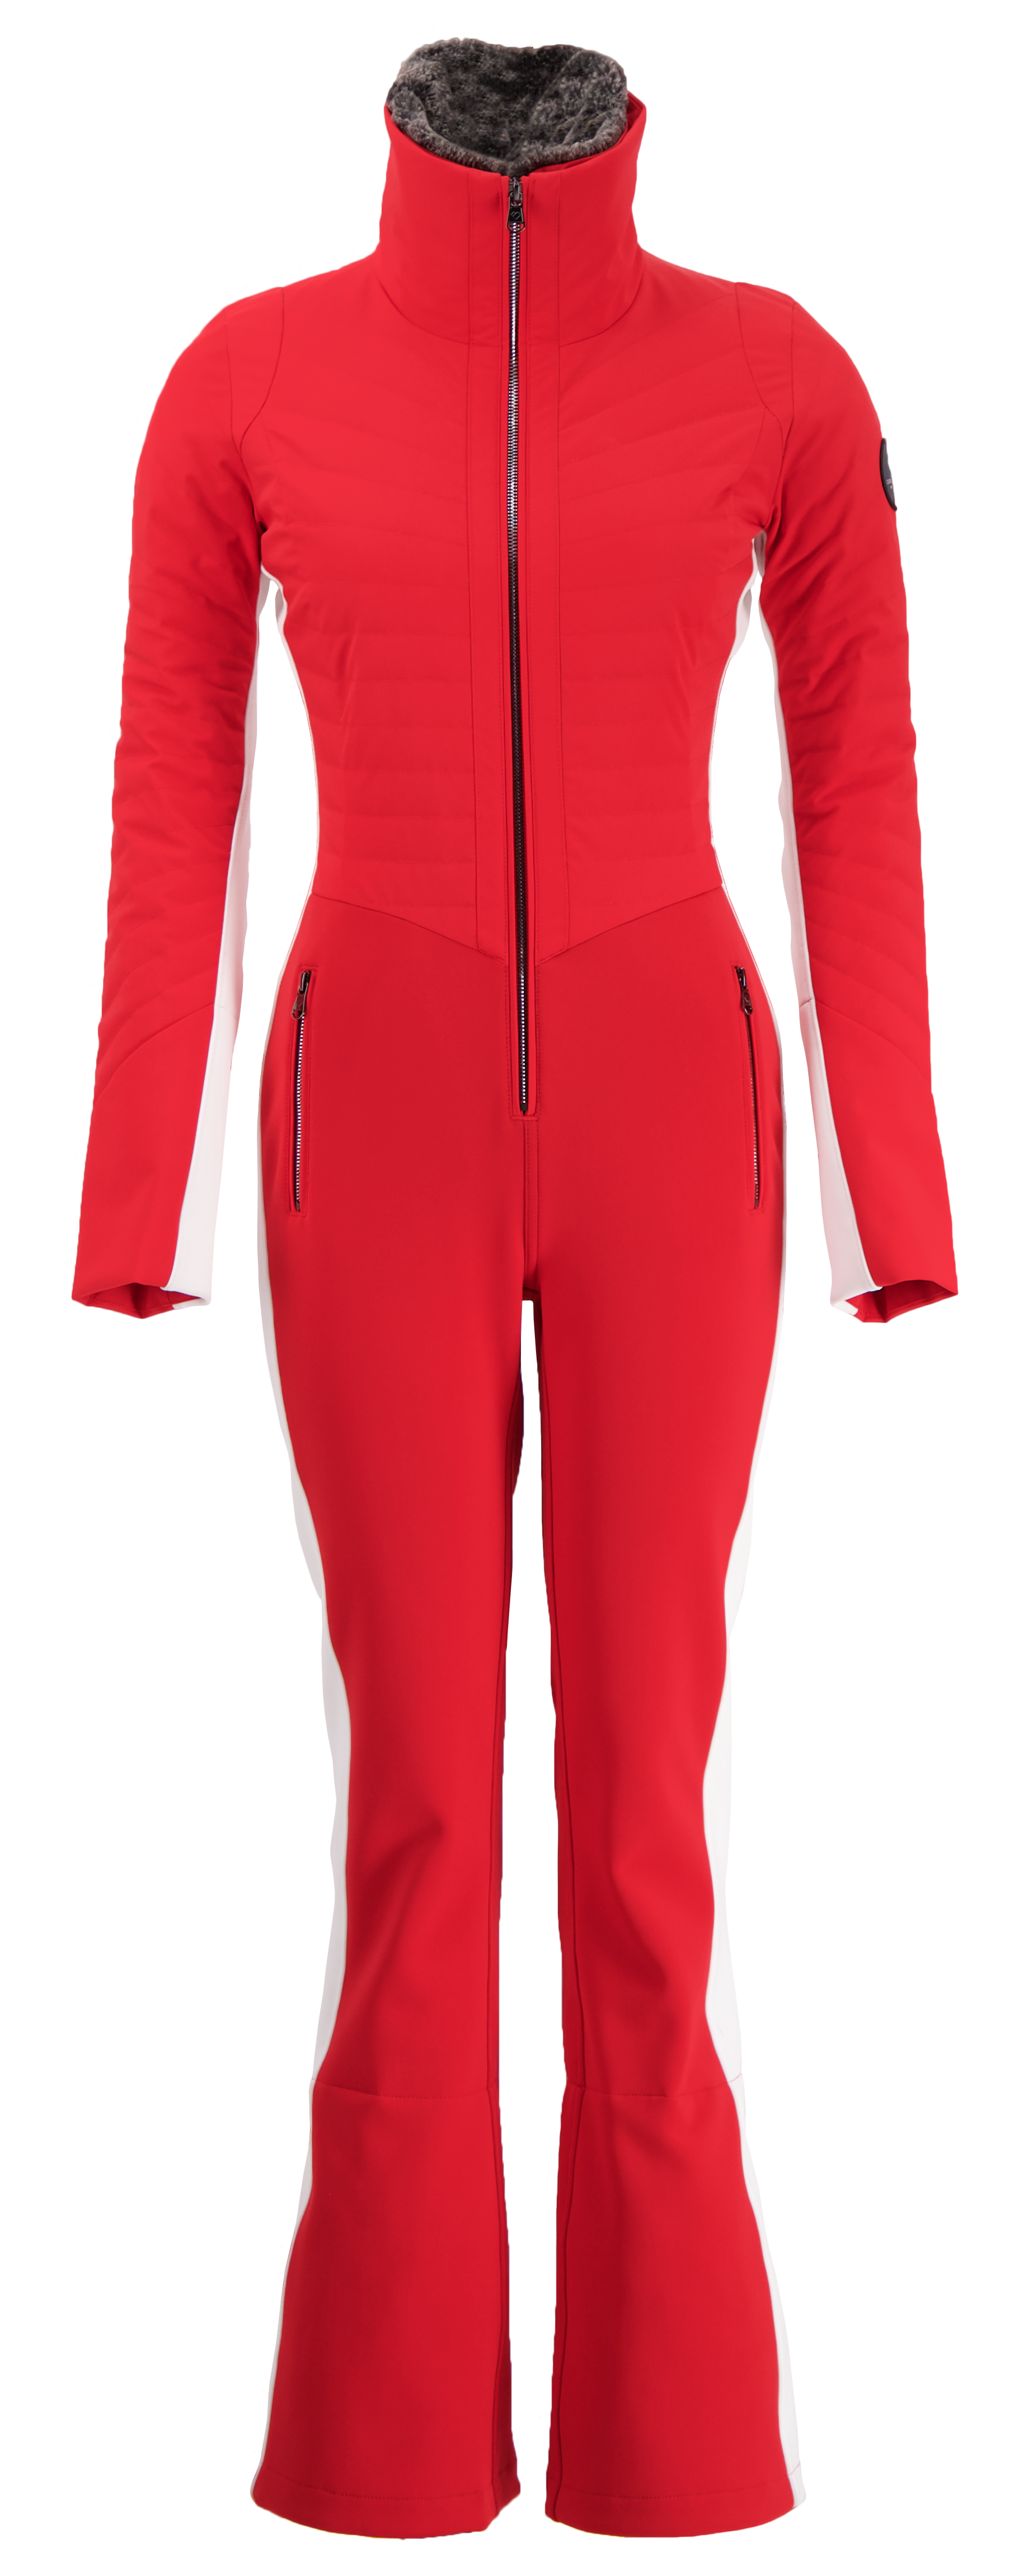 après-ski clothes.4